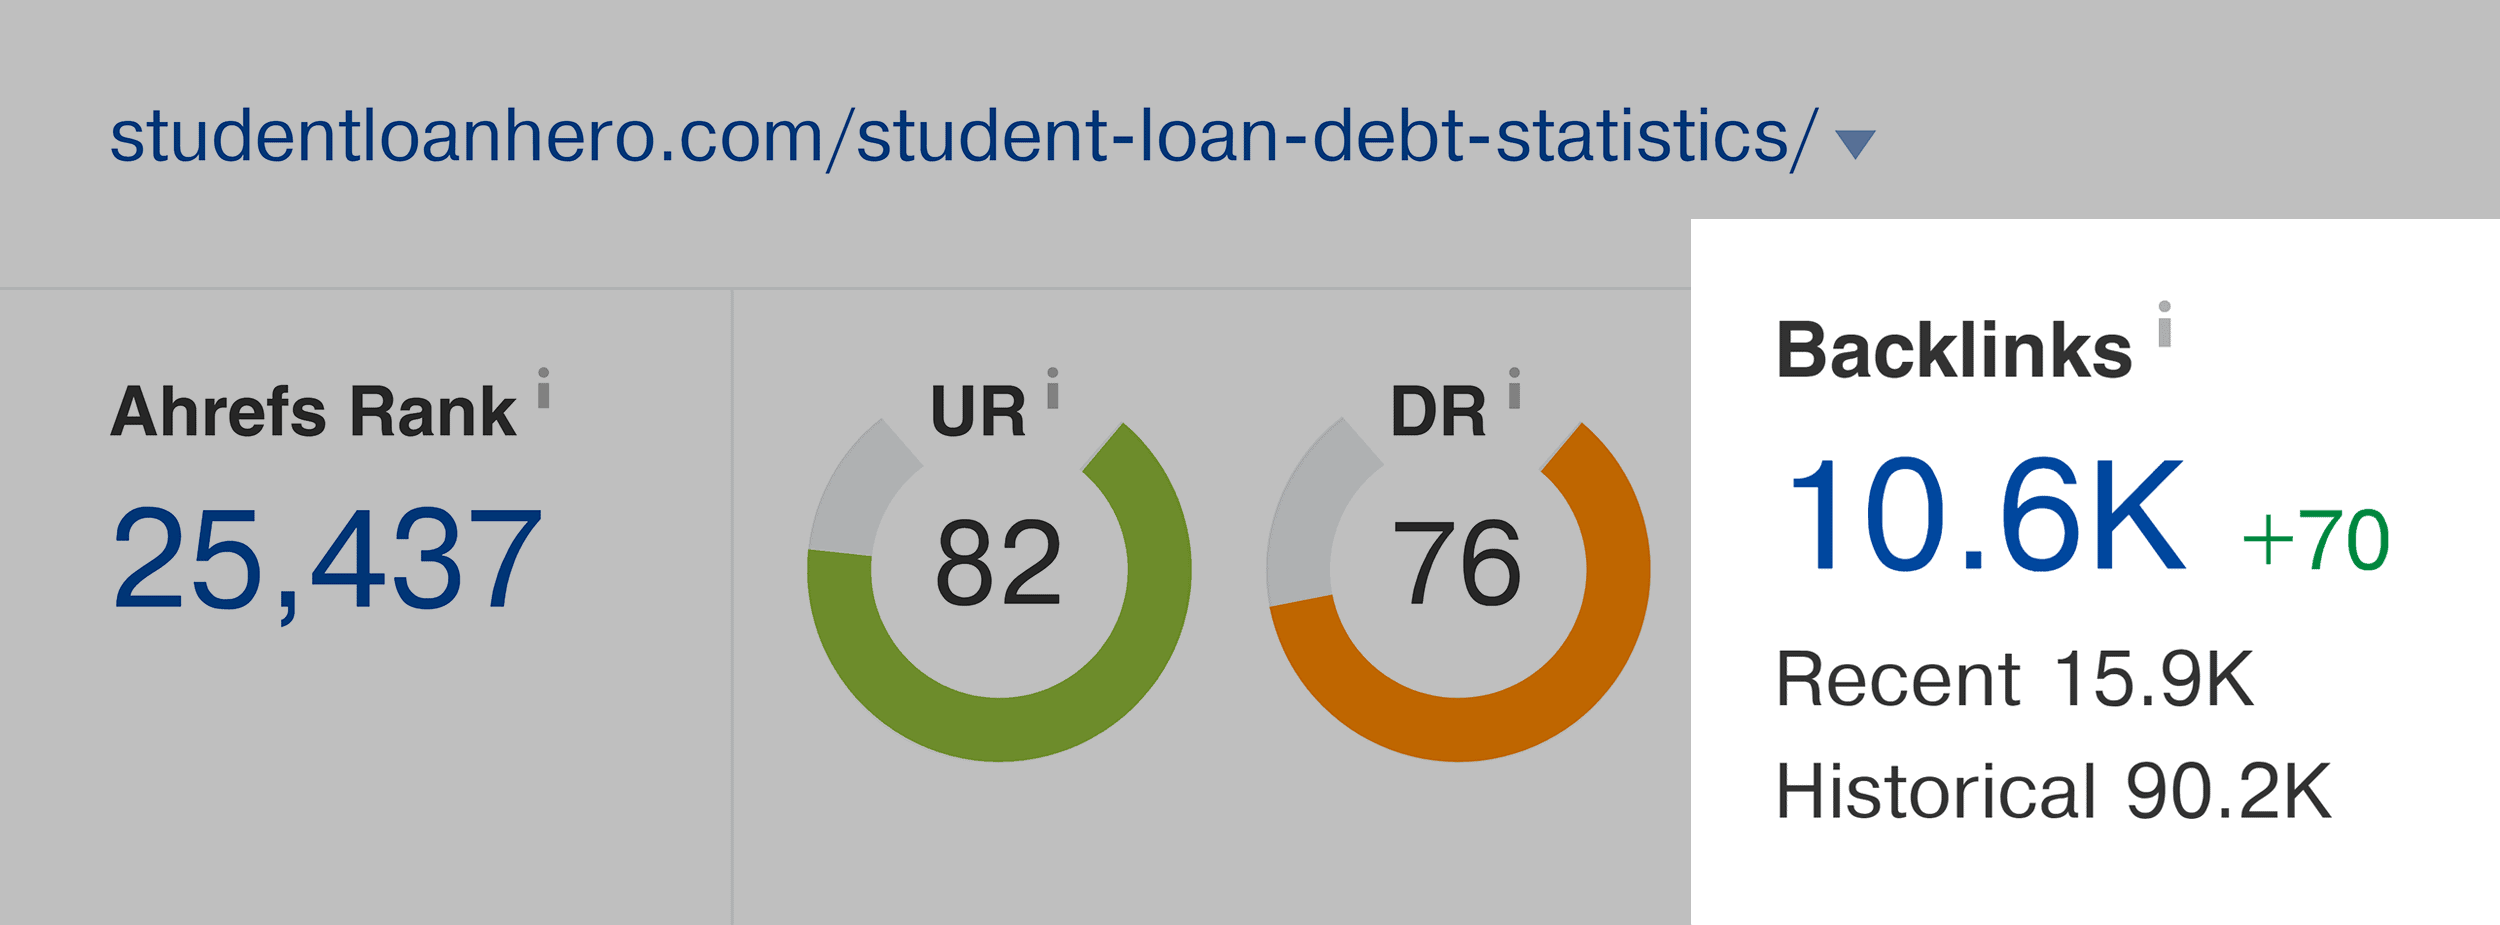 Ahrefs – Student loan debt statistics – Backlinks